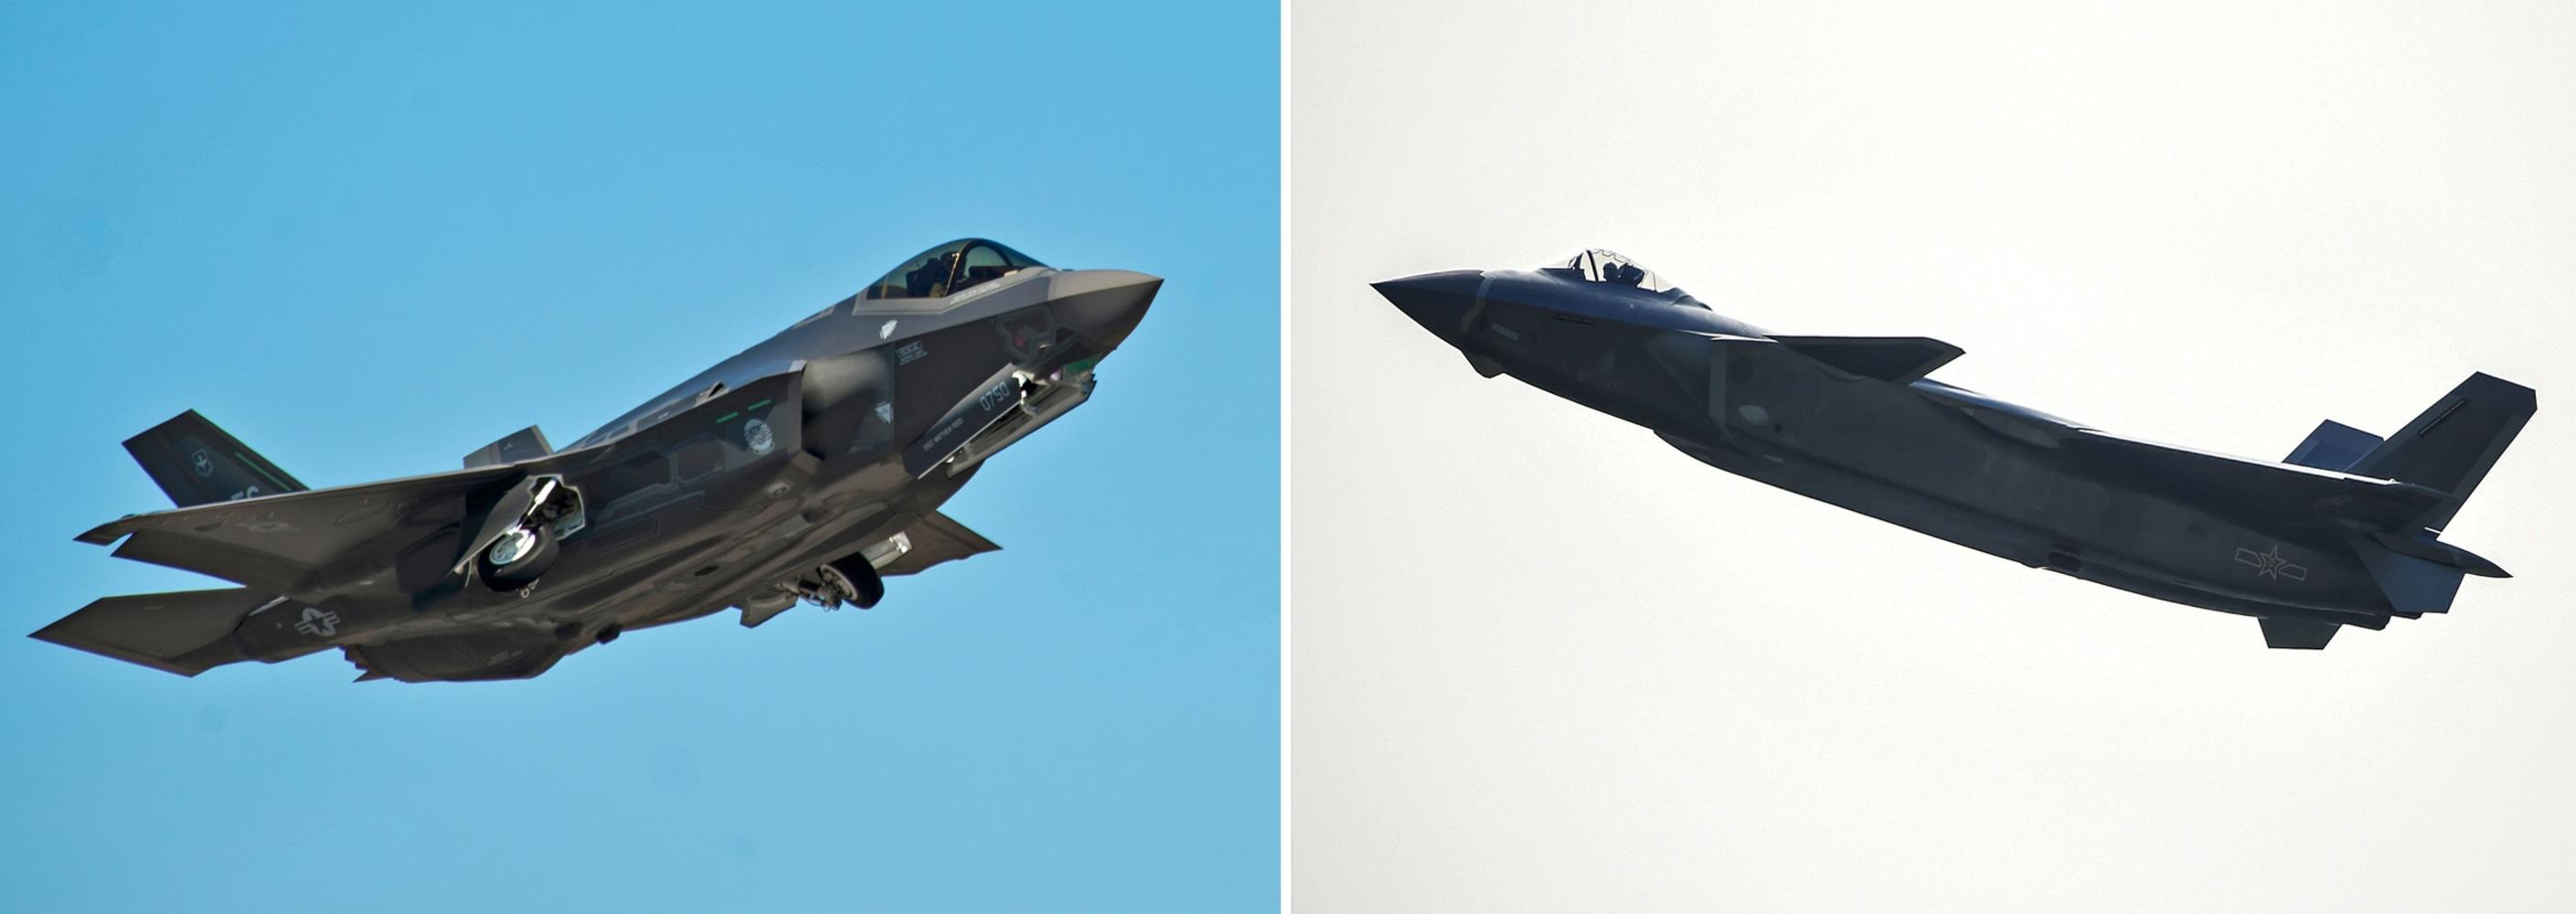 Lockheed Martin F35 Lightning II Canadian procurement